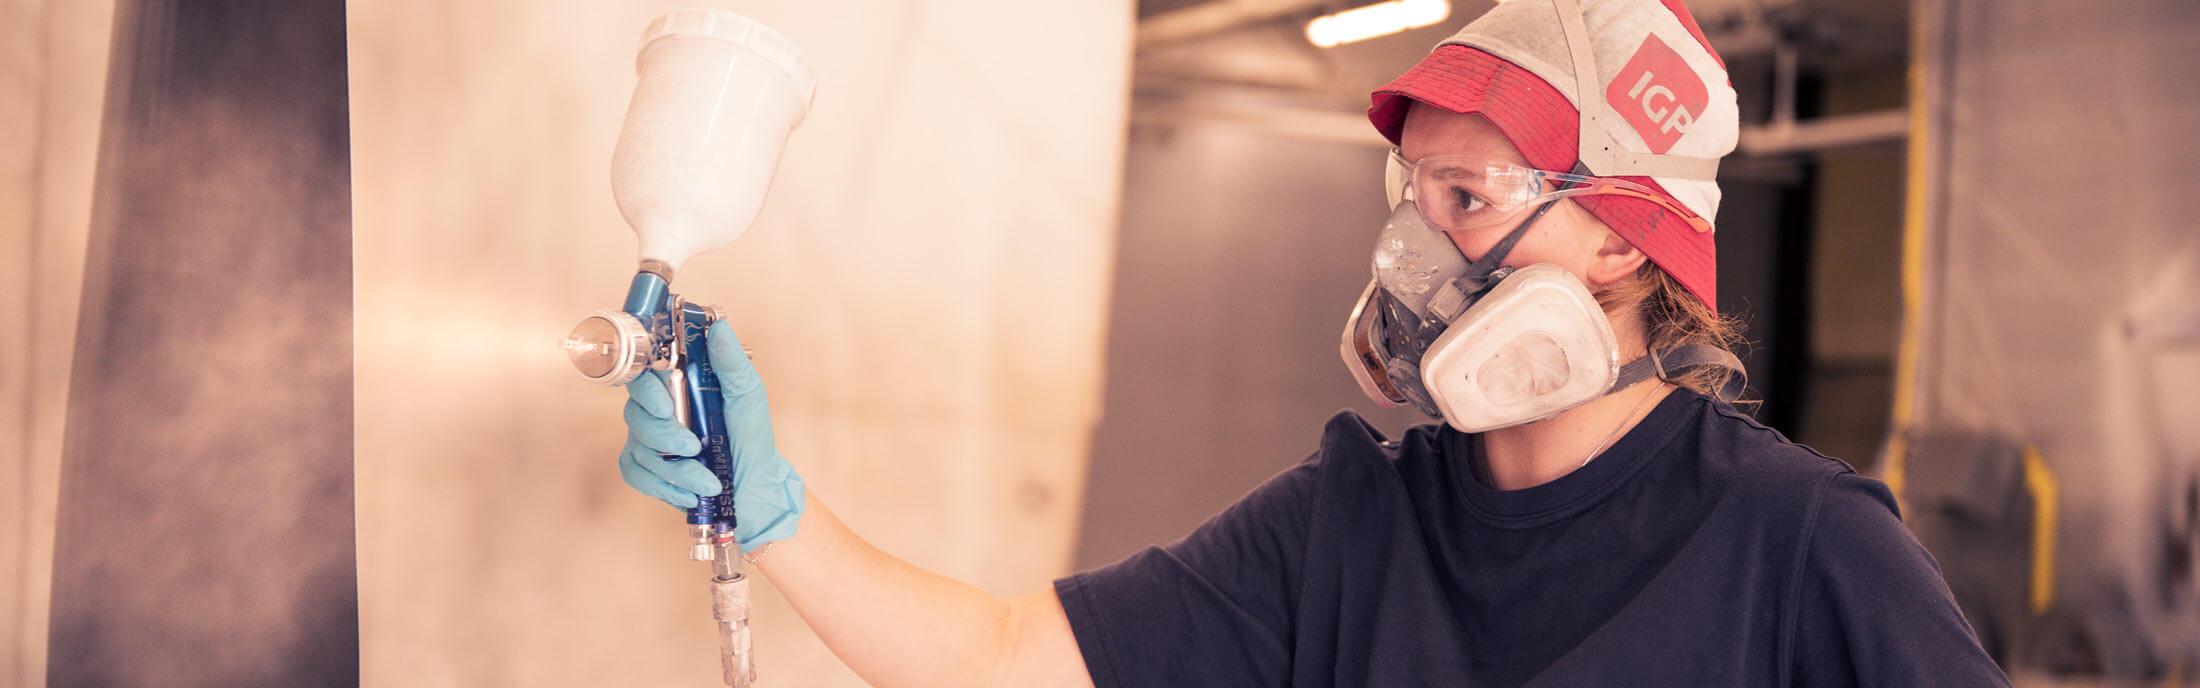 Nasslackierung, Werkstücke schützen, Beschichtungspartner